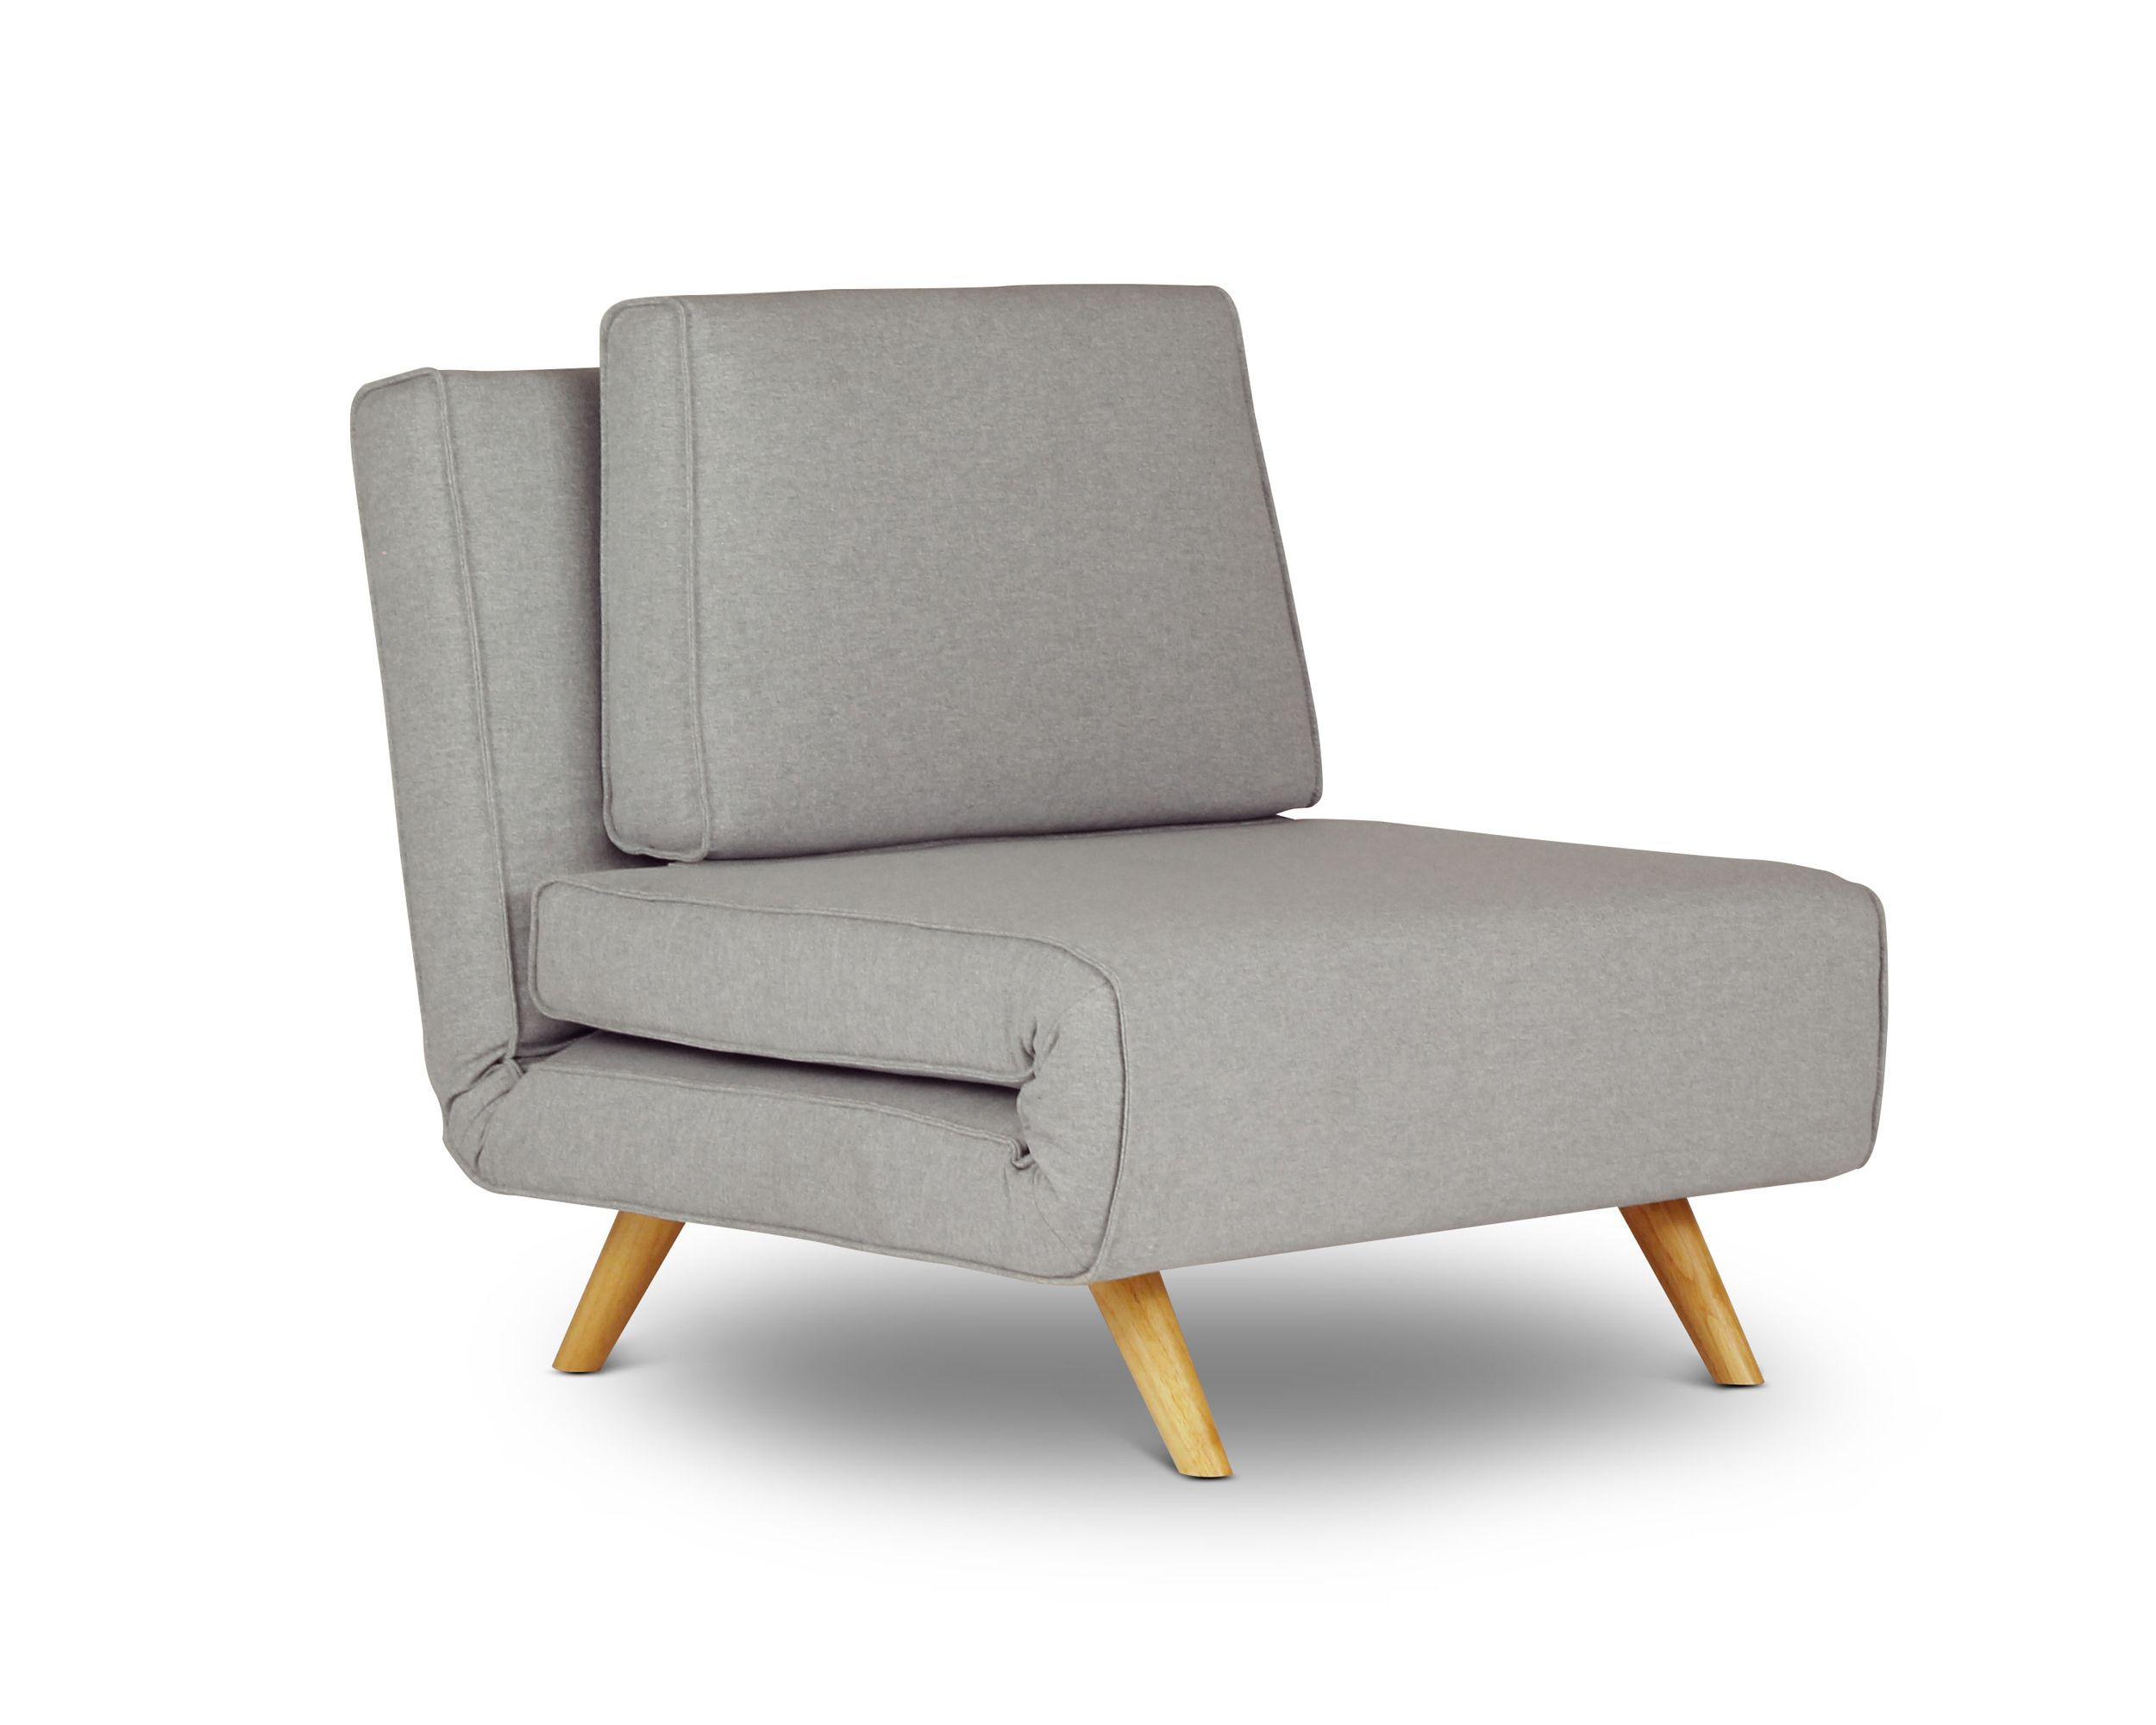 Armchair Sofa Beds Single sofa bed, Sofa bed design